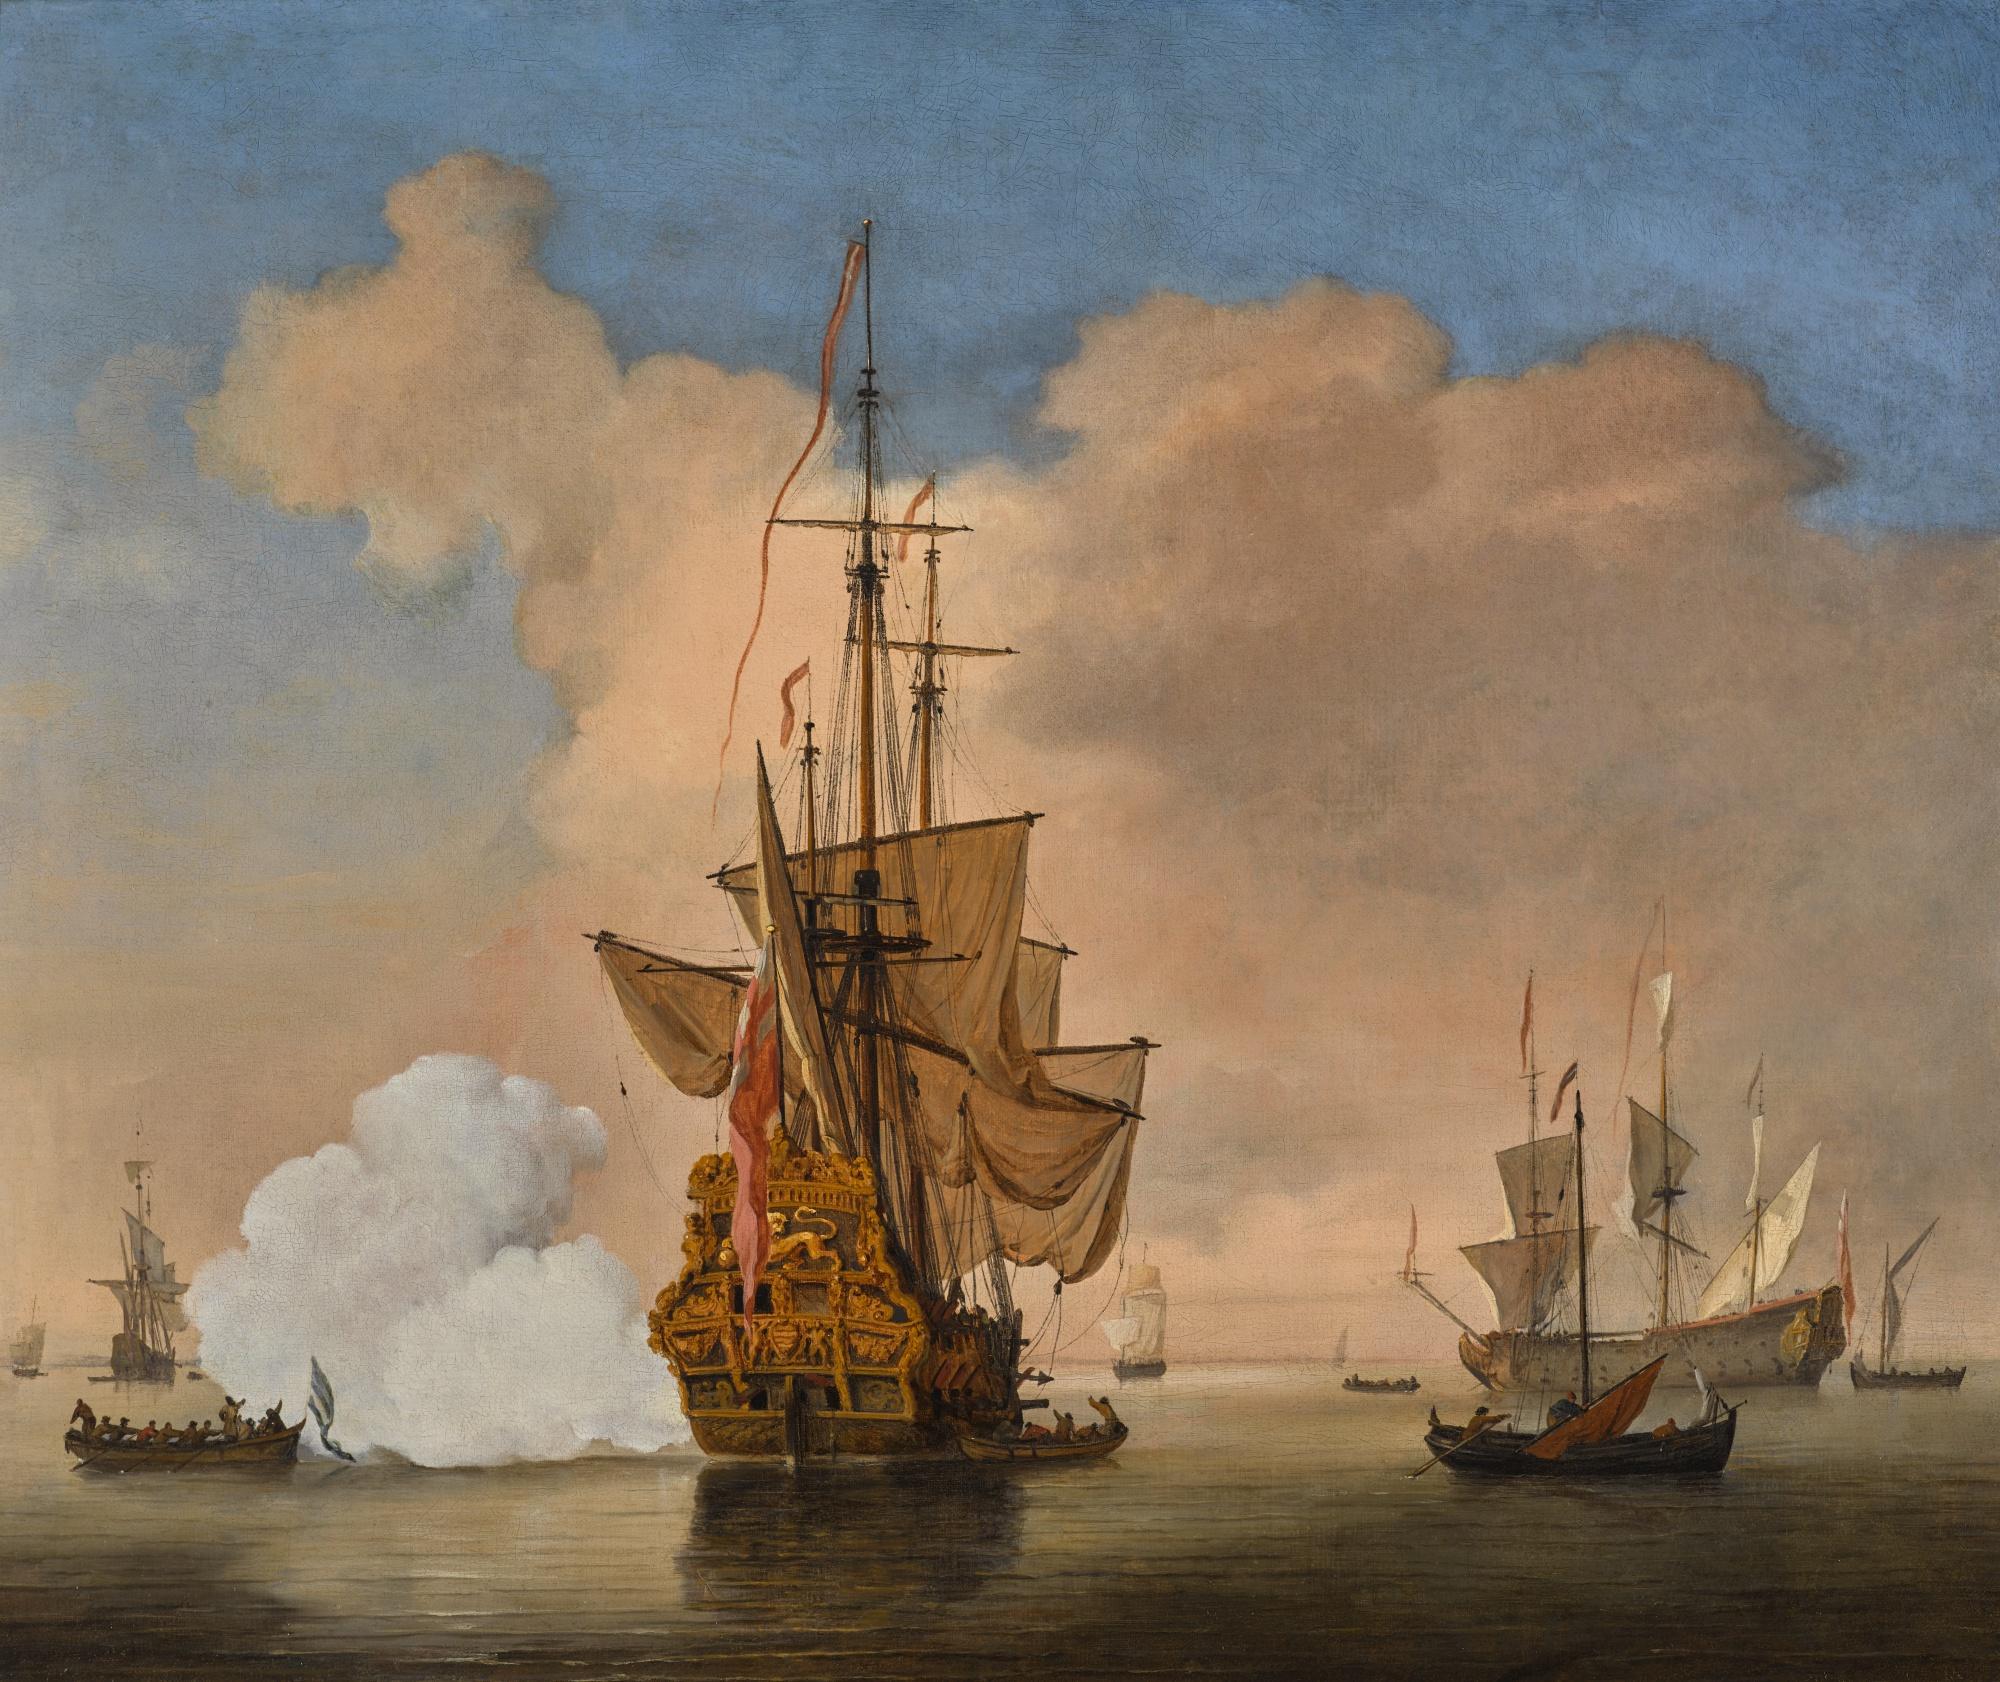 WILLEM VAN DE VELDE THE YOUNGER AND STUDIO (Leiden 1633 - 1707 London) A calm with an English Merchant Ship at anchor